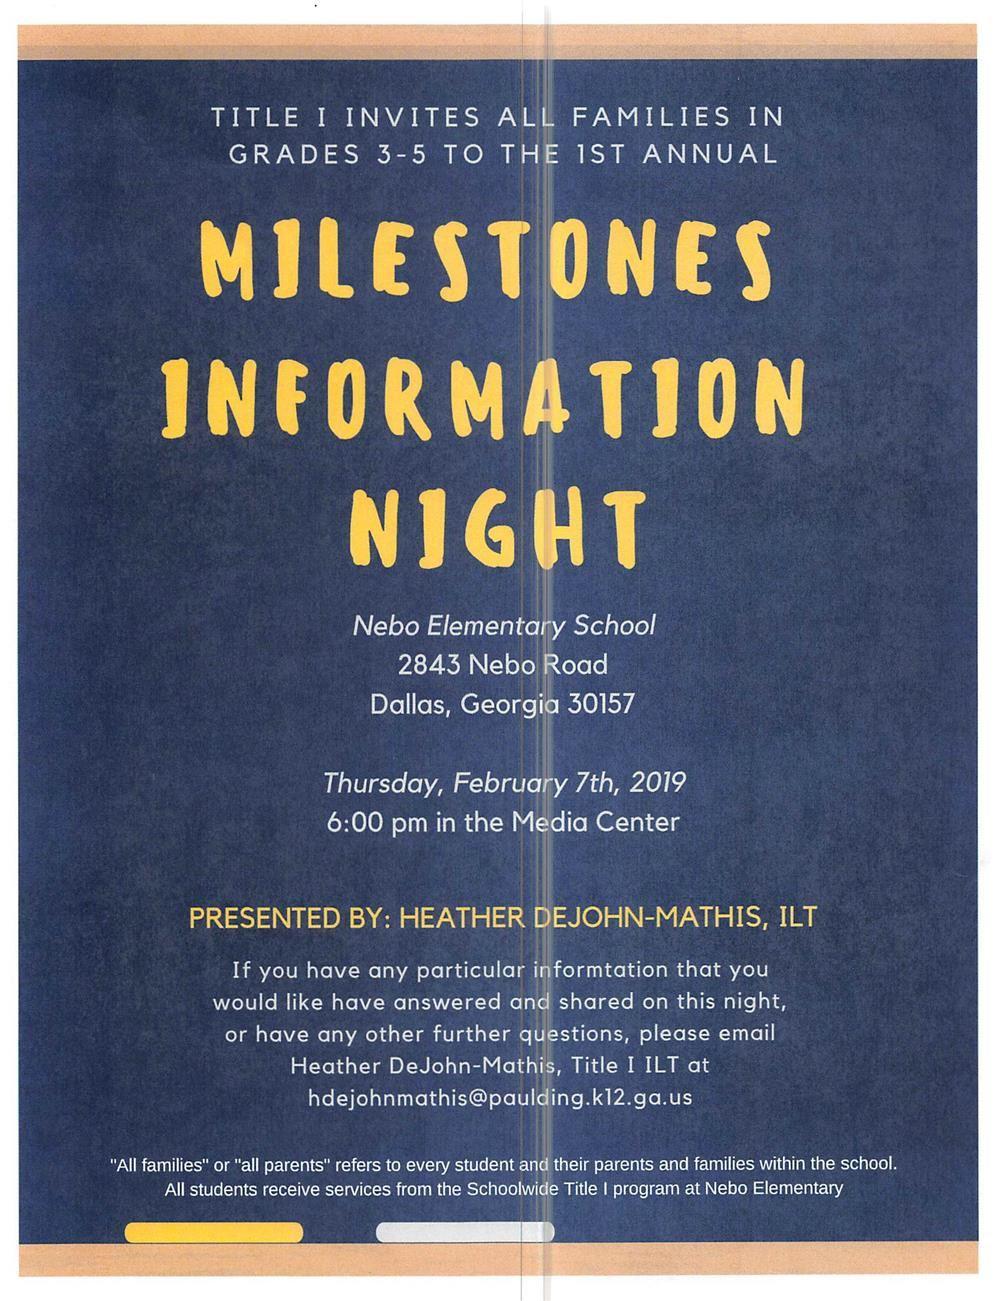 Title I Academic Night: Milestones Information Night